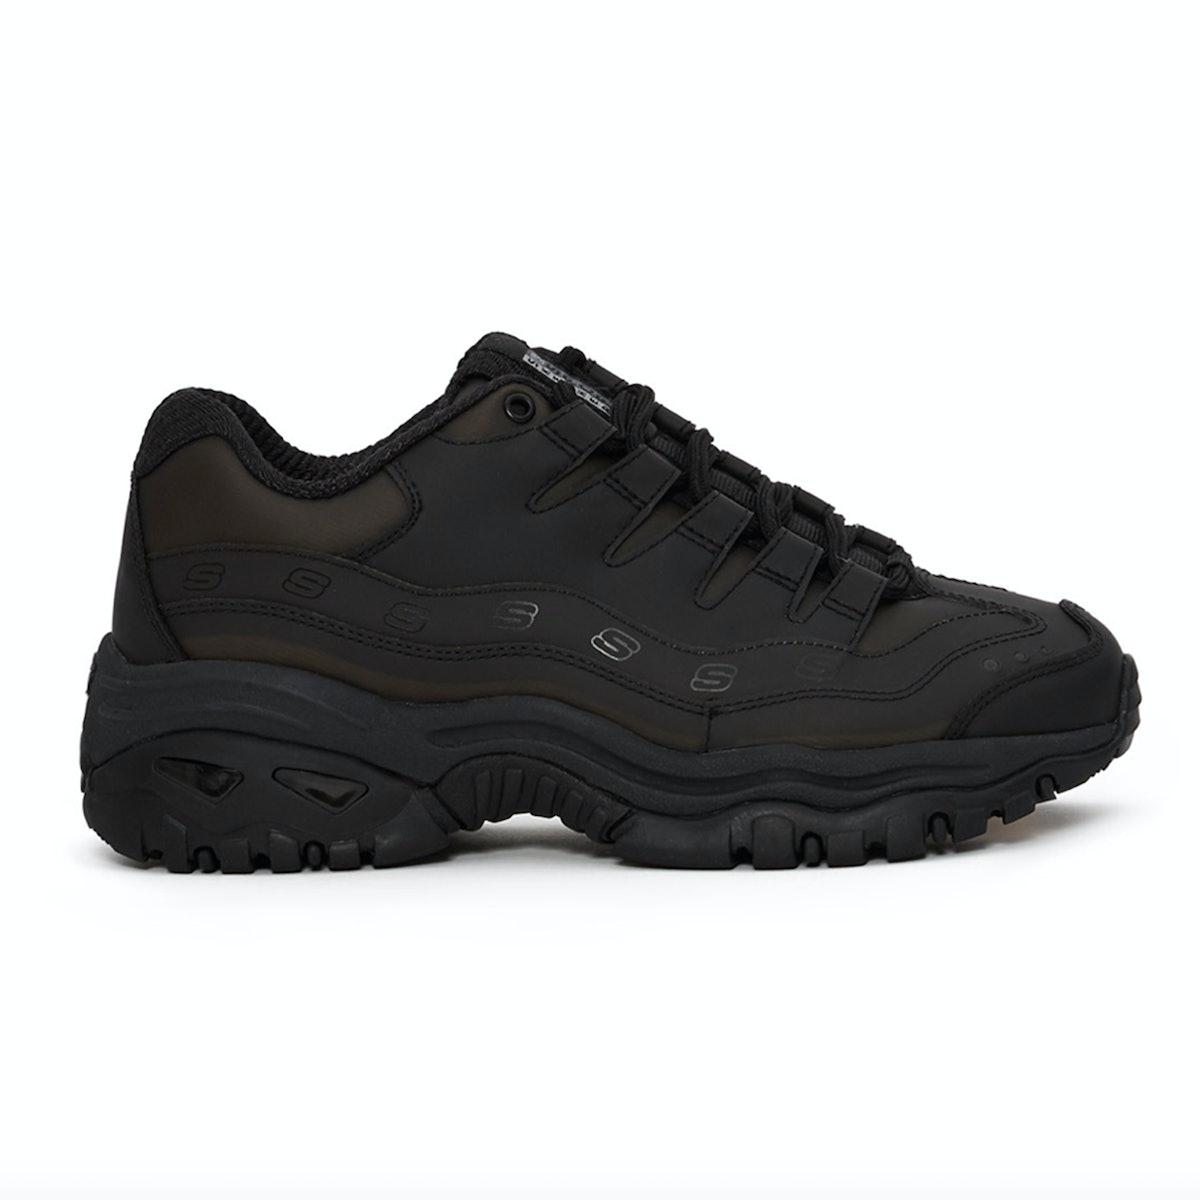 "Opening Ceremony x Skechers Energy Sneakers in ""Black"""